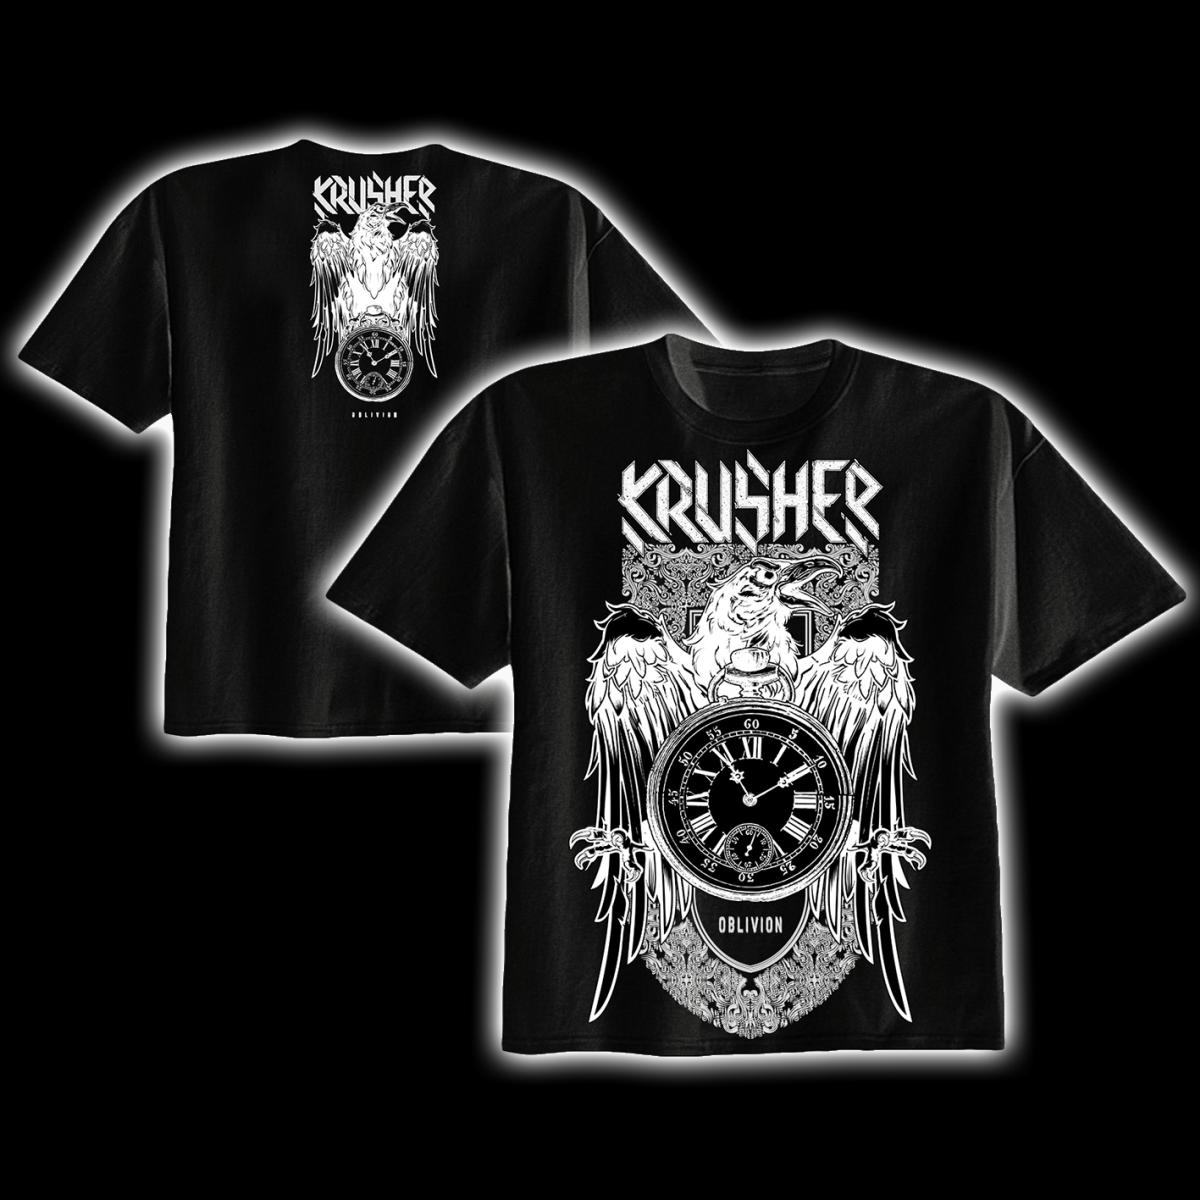 Krusher Oblivion T Shirt Black